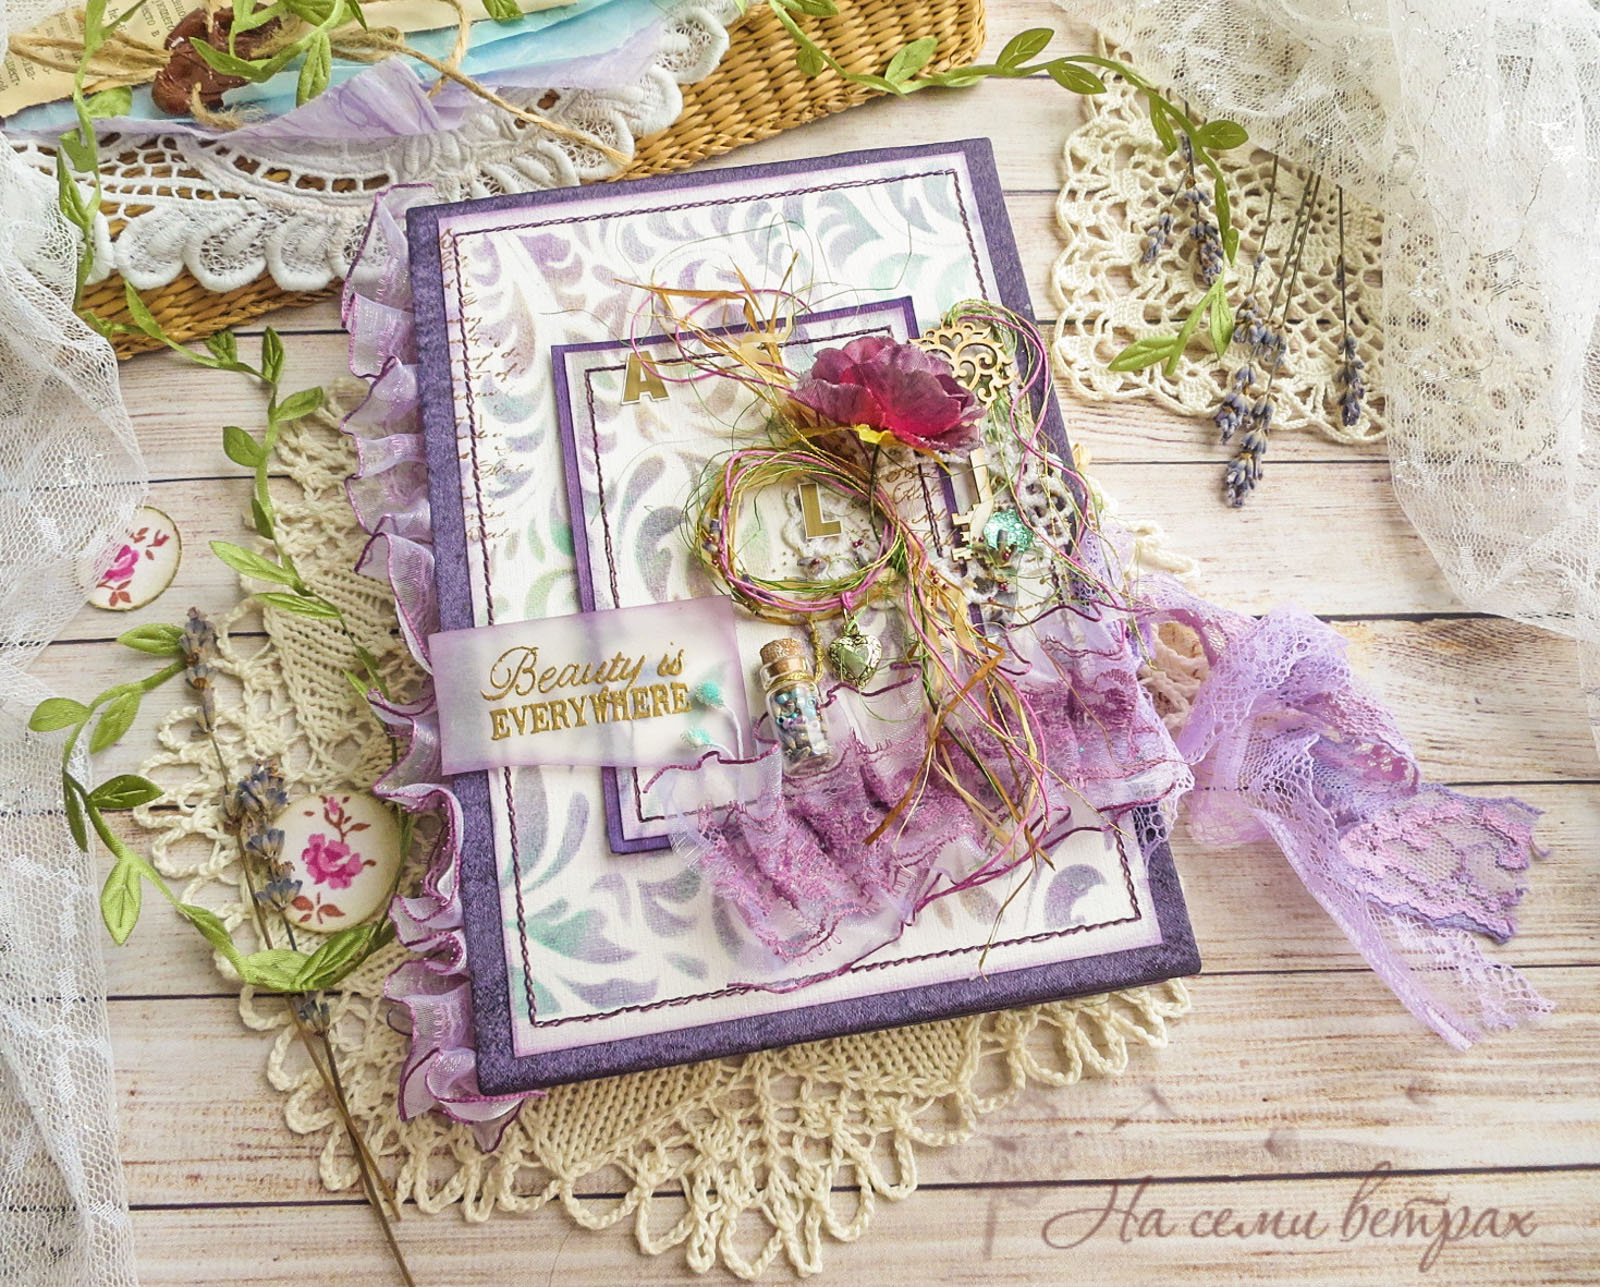 Lavender, box, scrapbooking, papercraft, коробочка-книга, лаванда, романтичный подарок, бутылочка, розы, троянди